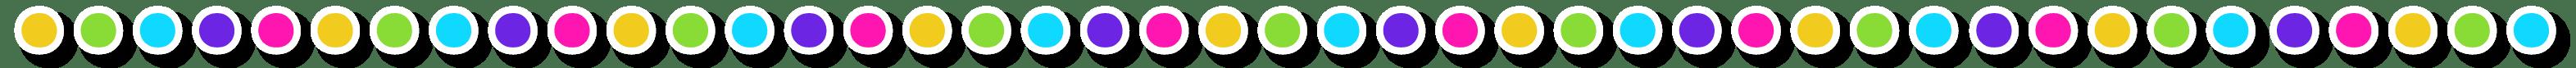 Common Core Reading Comprehension Logo Dots